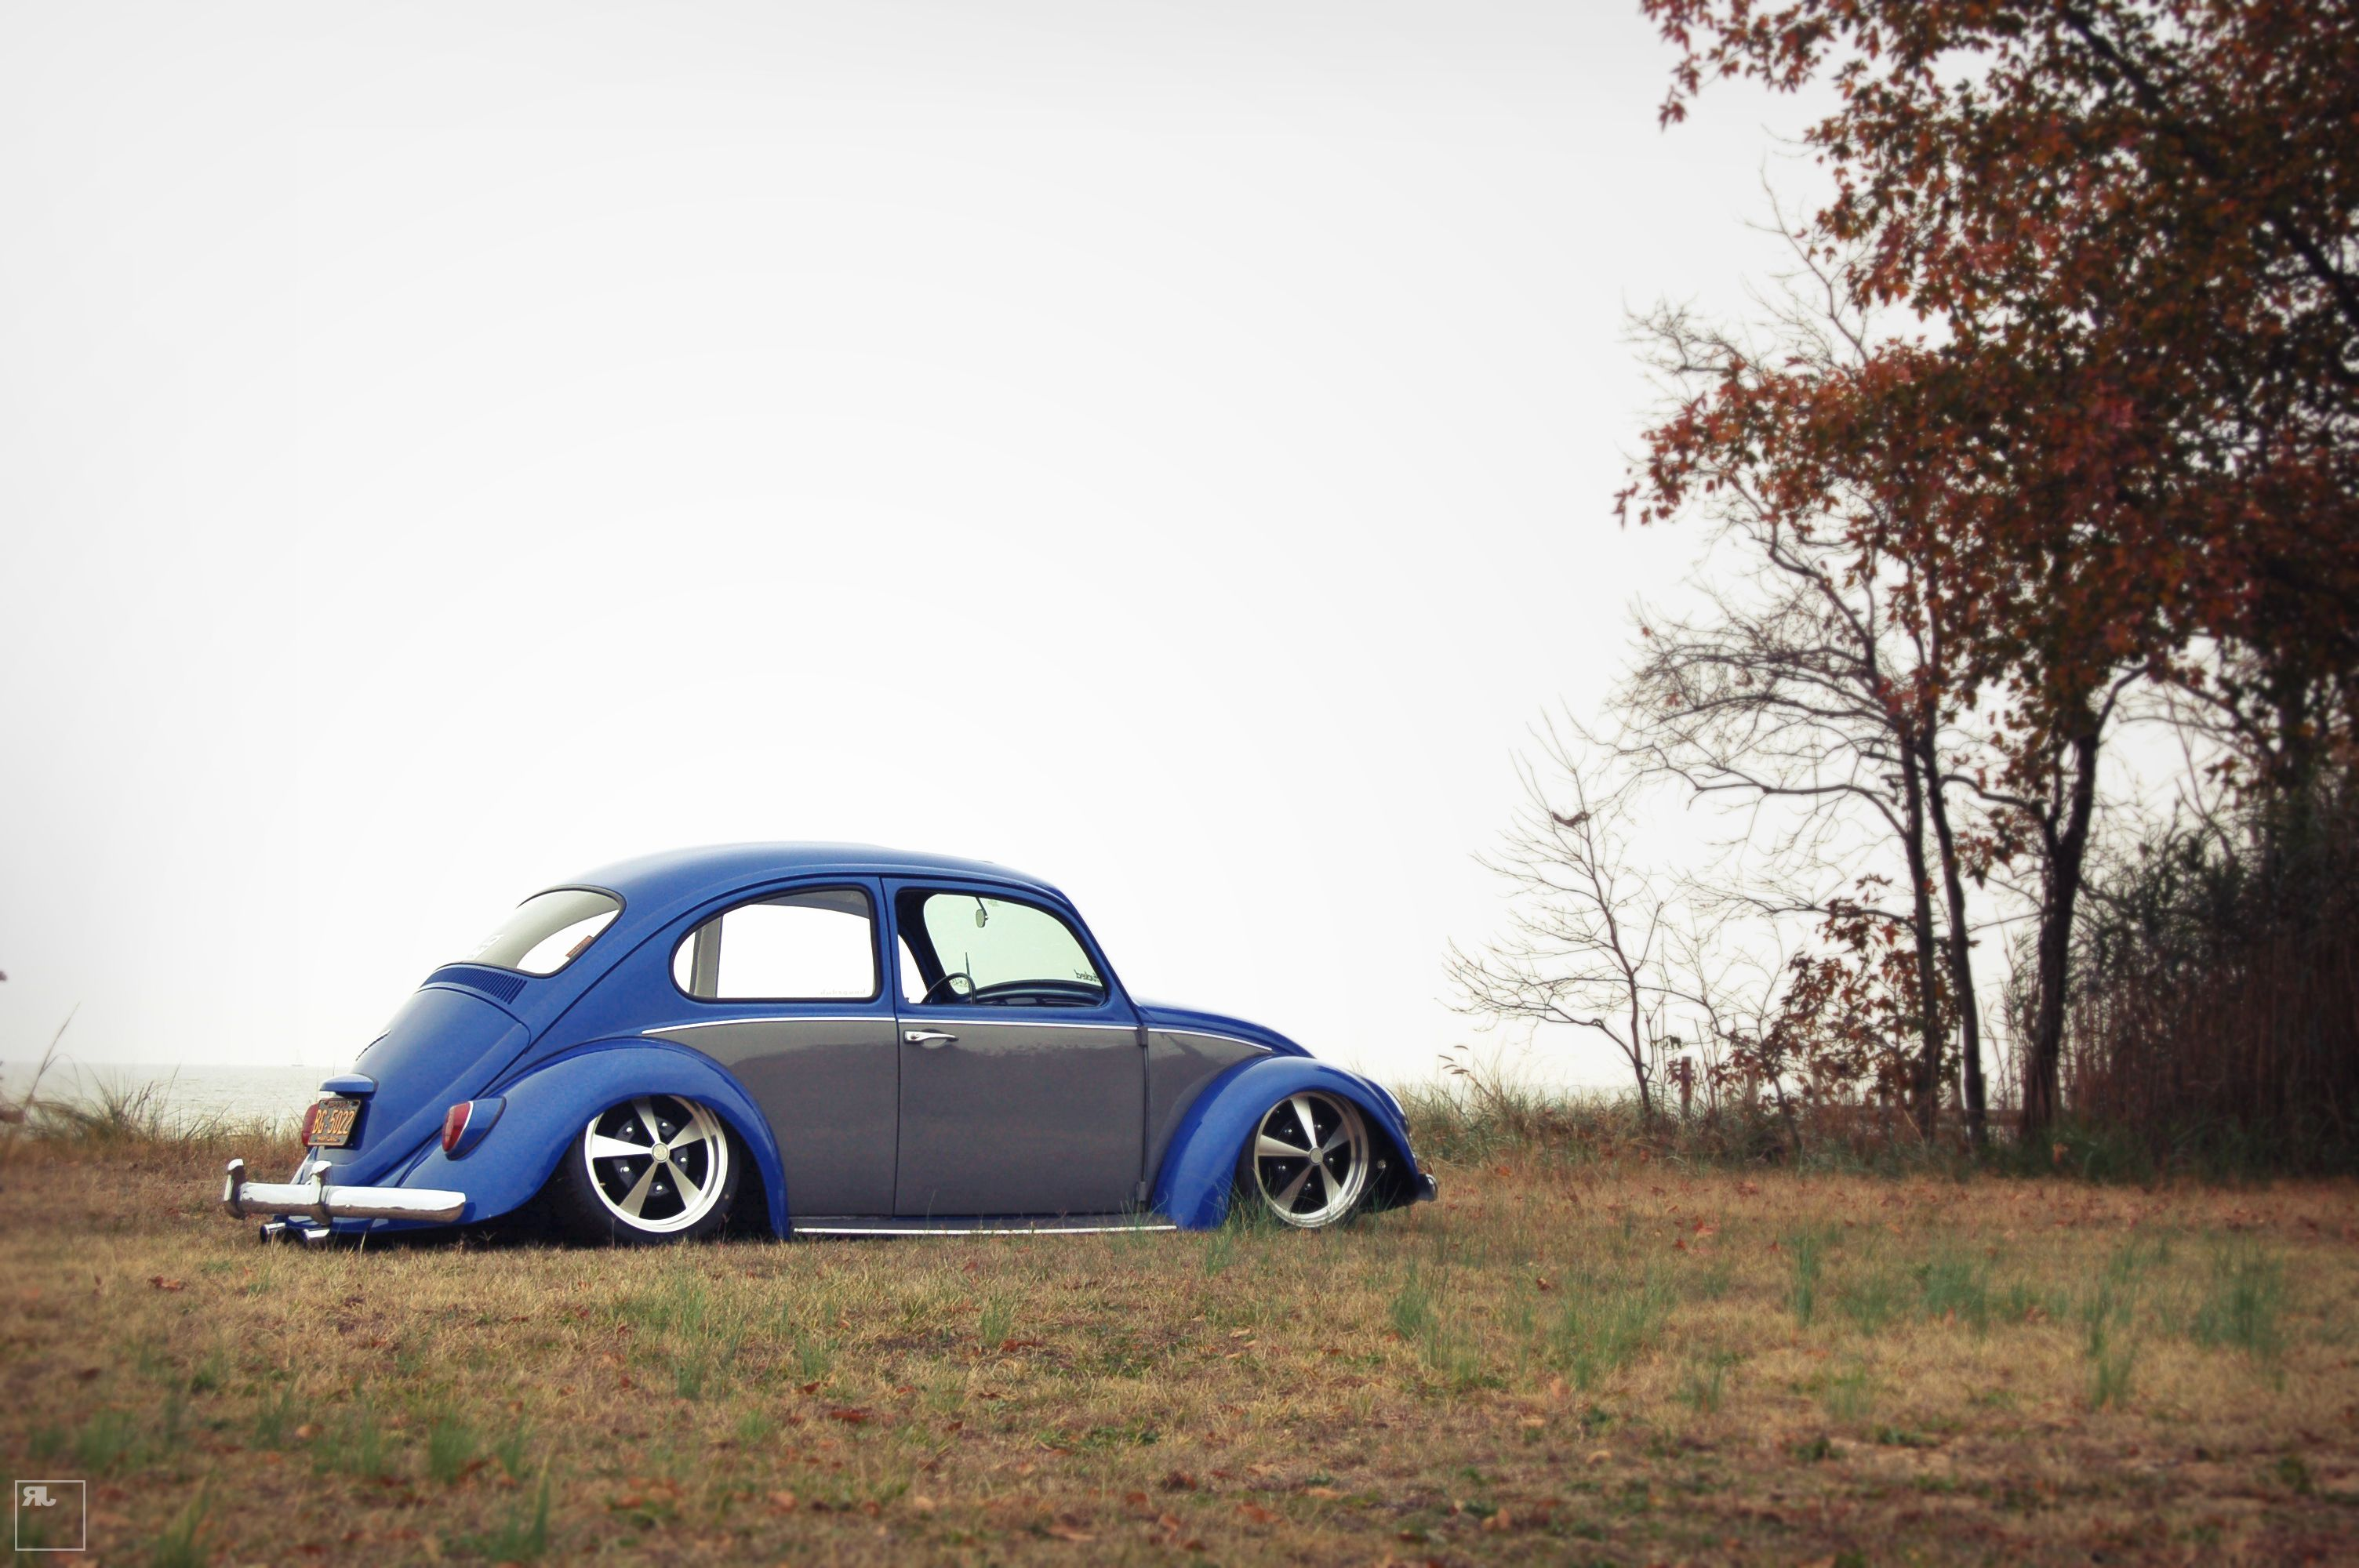 m driven photo auto sport ffzybtgy marz volkswagen velbert new tsi frontansicht file craigslist vw jpg itok beetle car